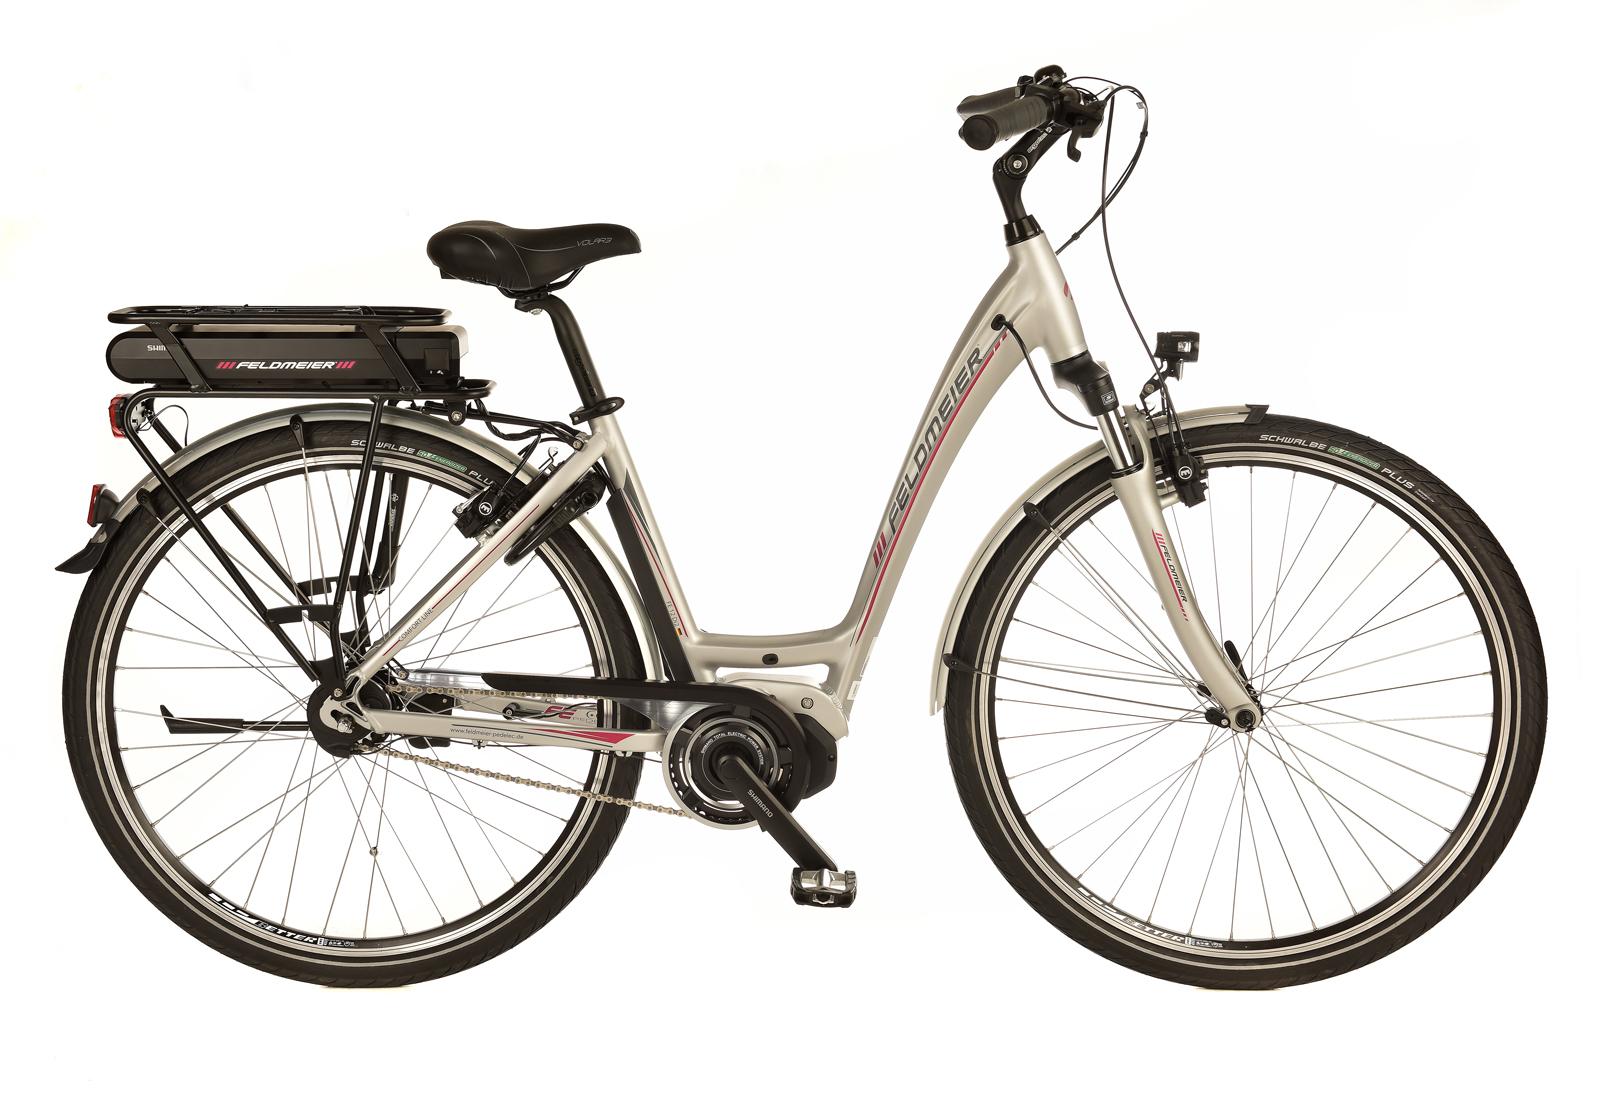 AXA Akku-Rahmenschloss Shimano Steps schwarz Fahrrad